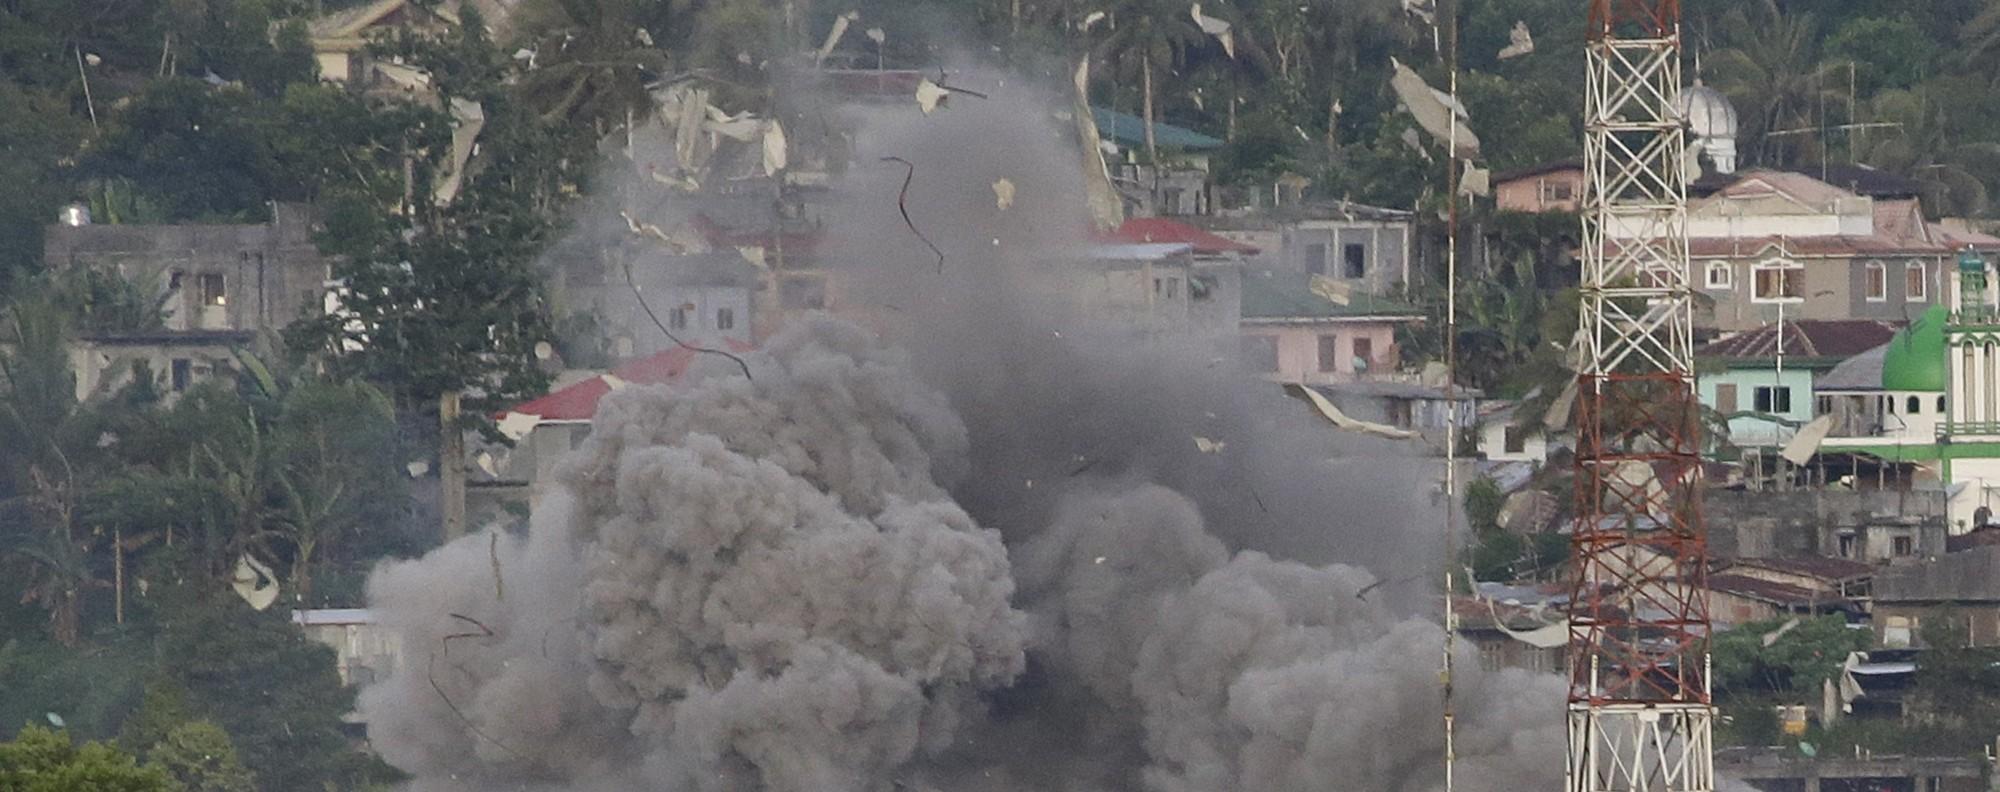 Government jets bomb Marawi. Photo: AP